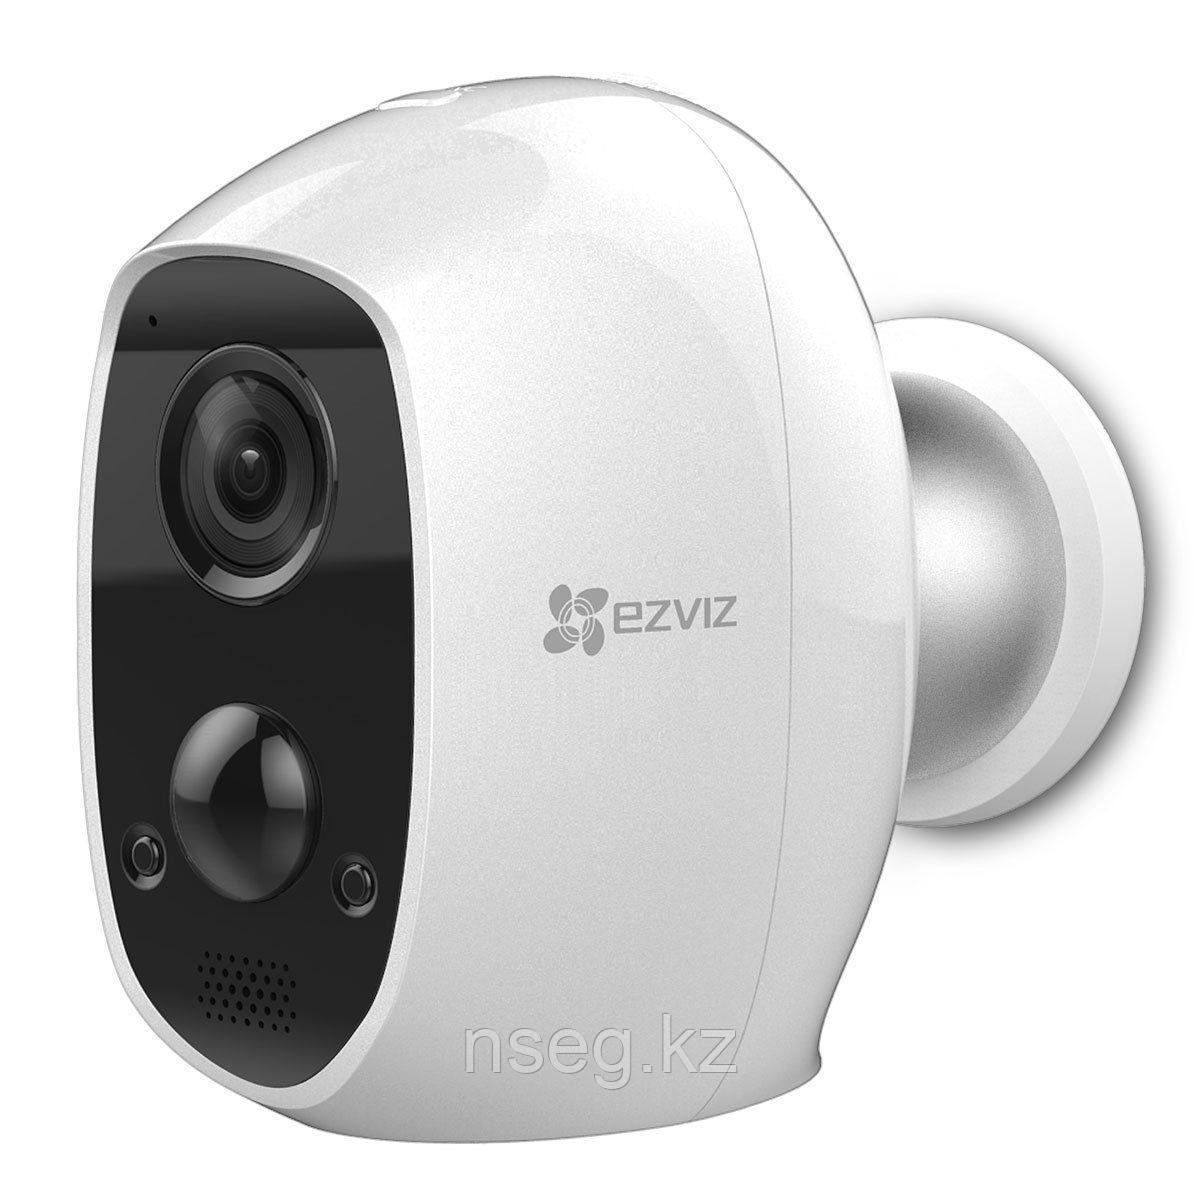 1Мп Wi-Fi камера Ezviz C3A